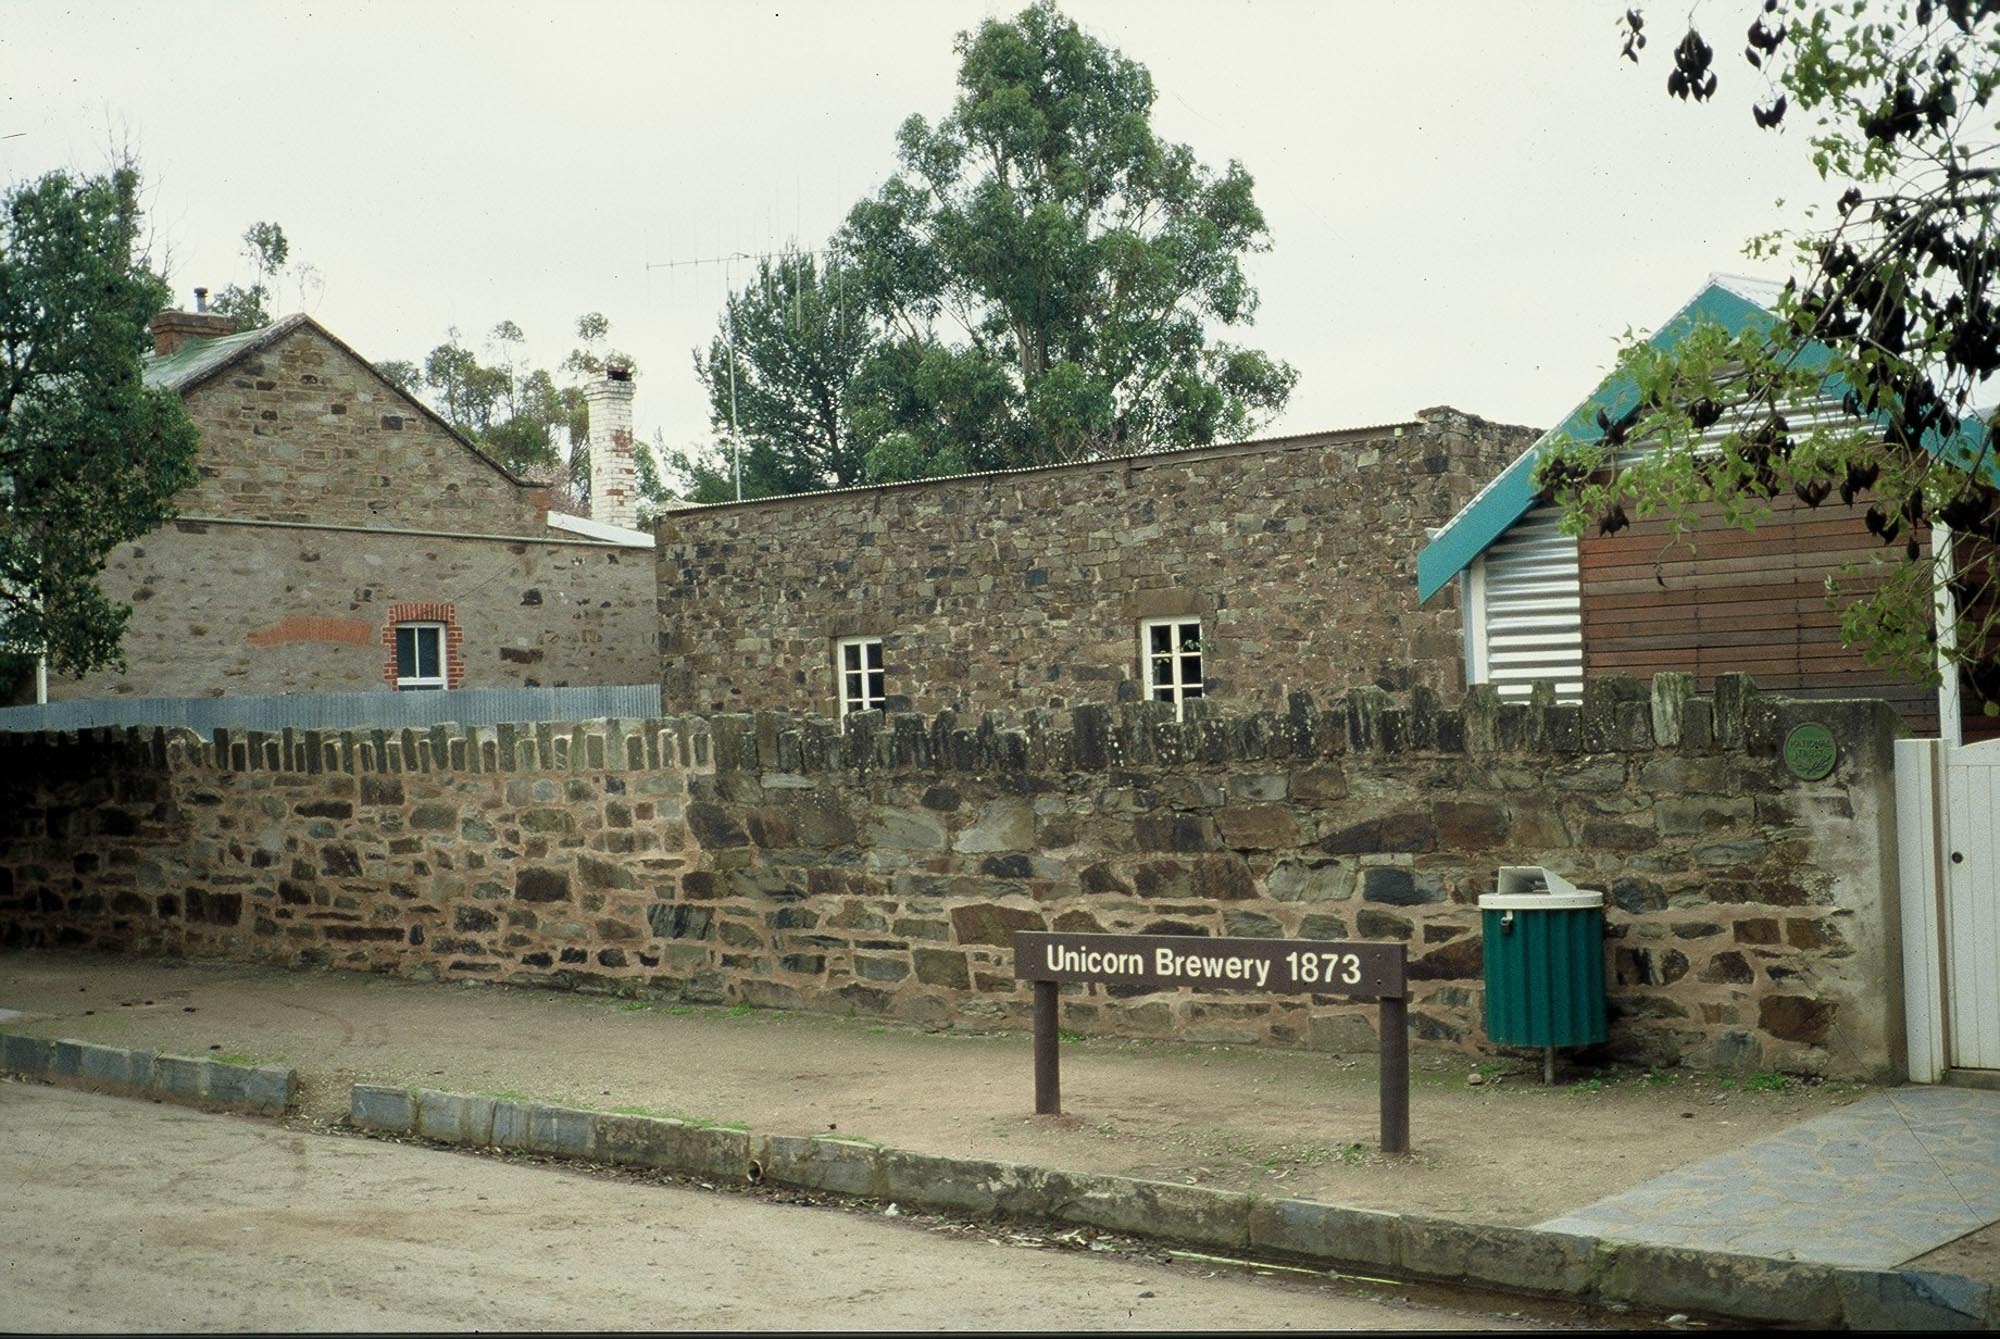 2001 - Unicorn Brewery